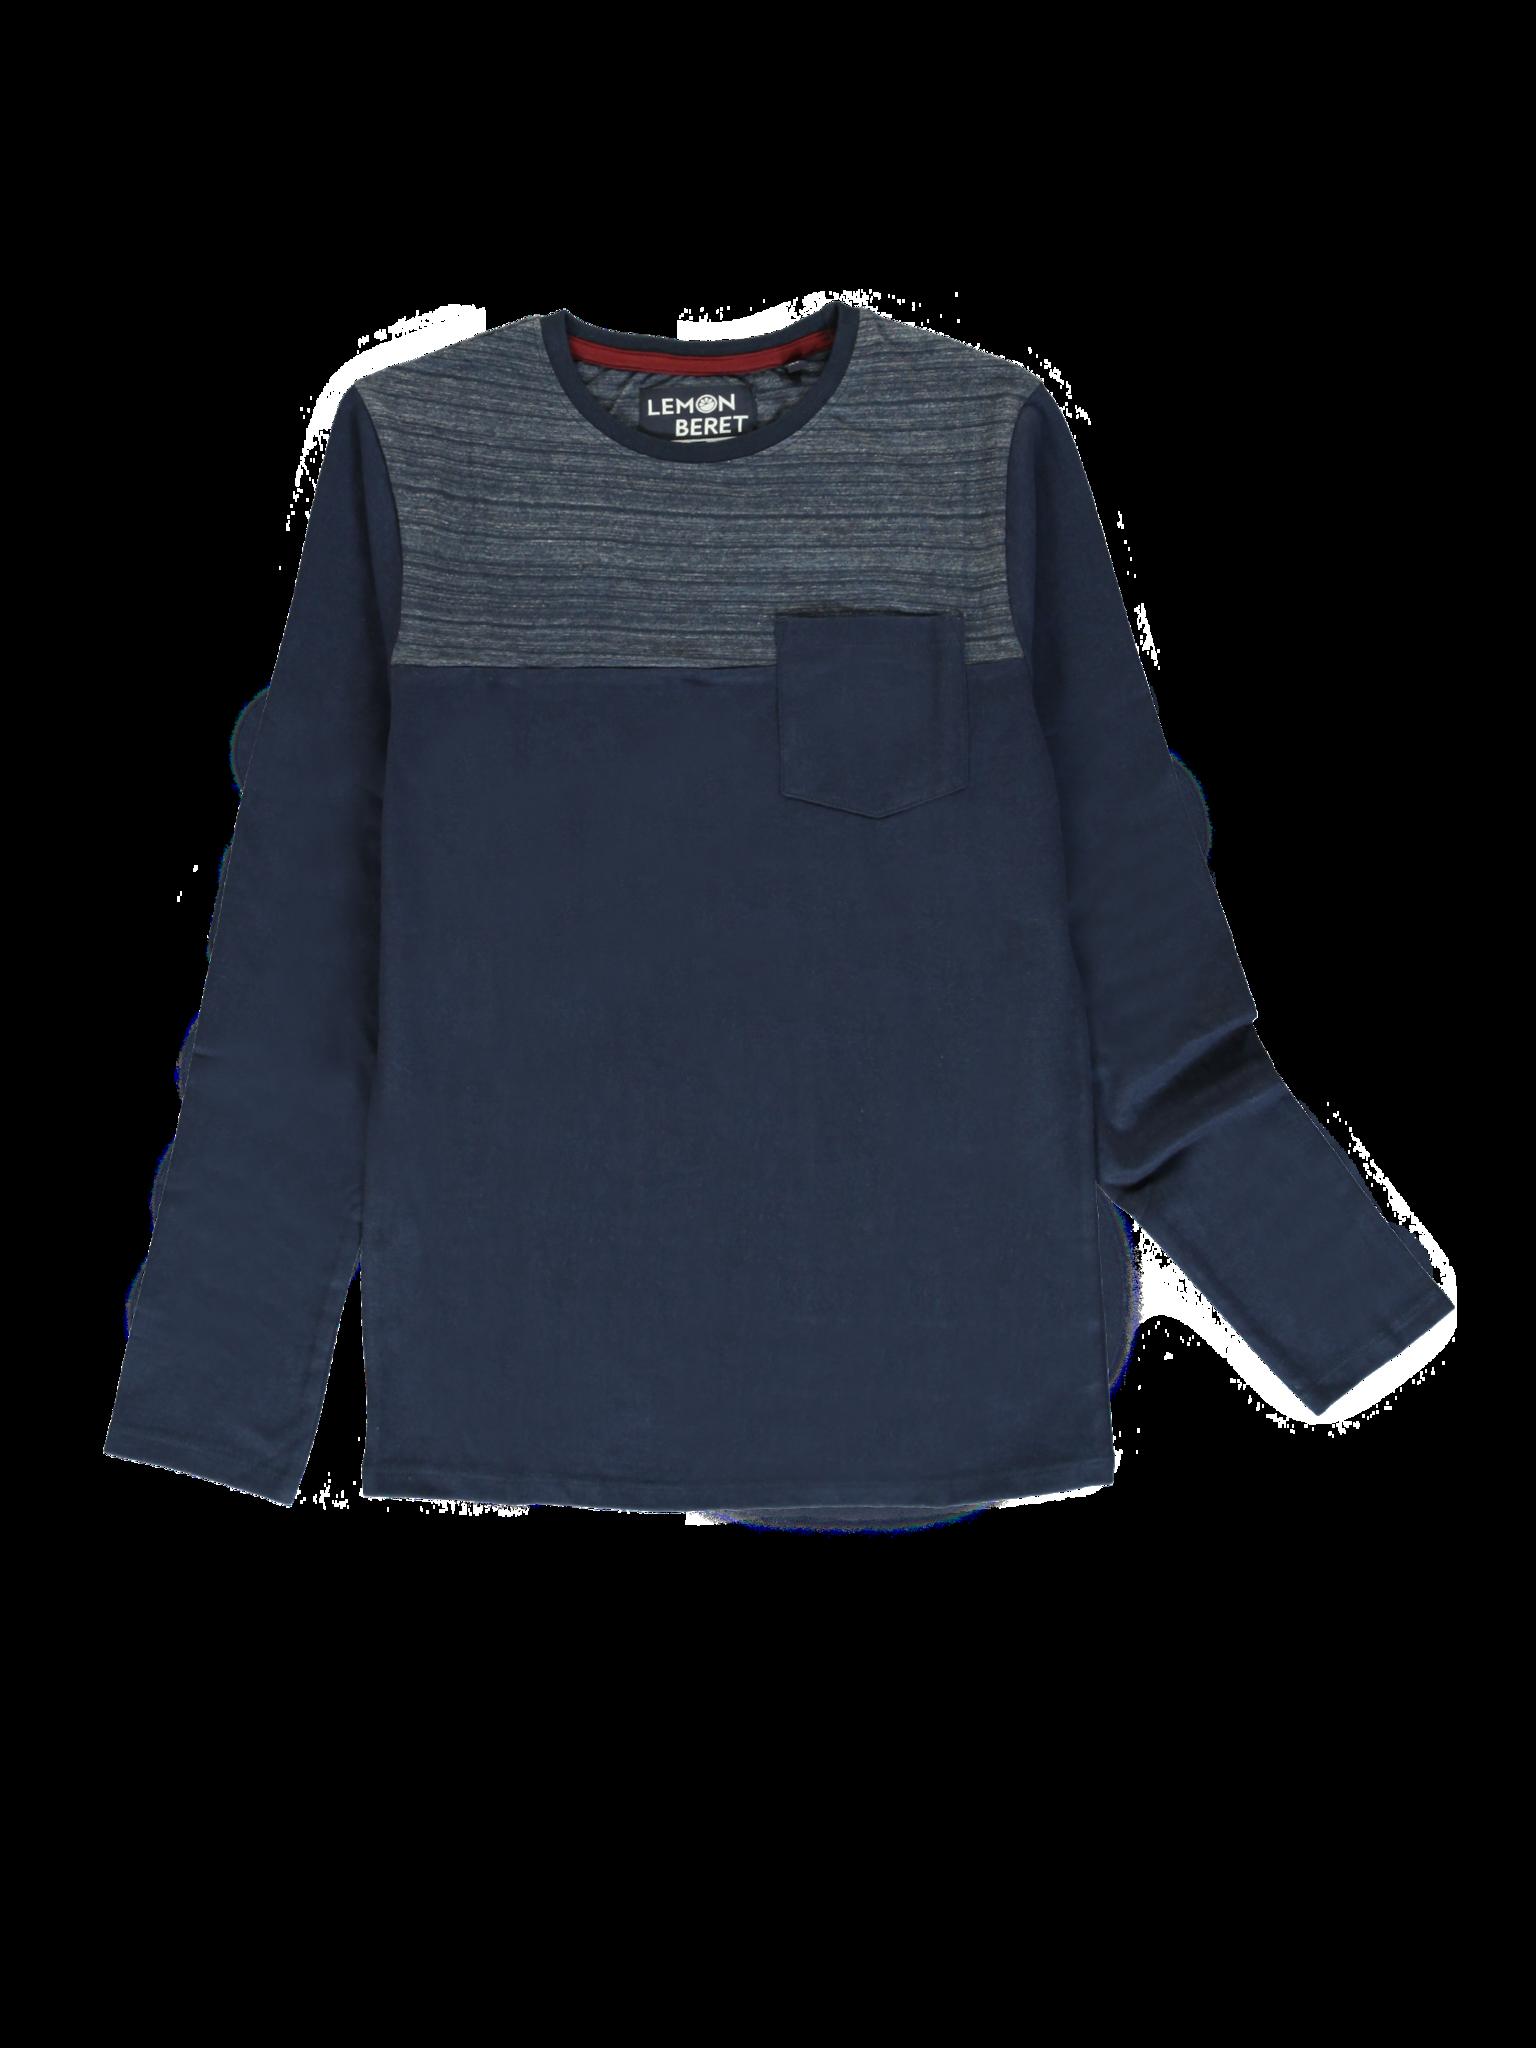 All Brands | Winterproducts Teen Boys | T-shirt | 12 pcs/box